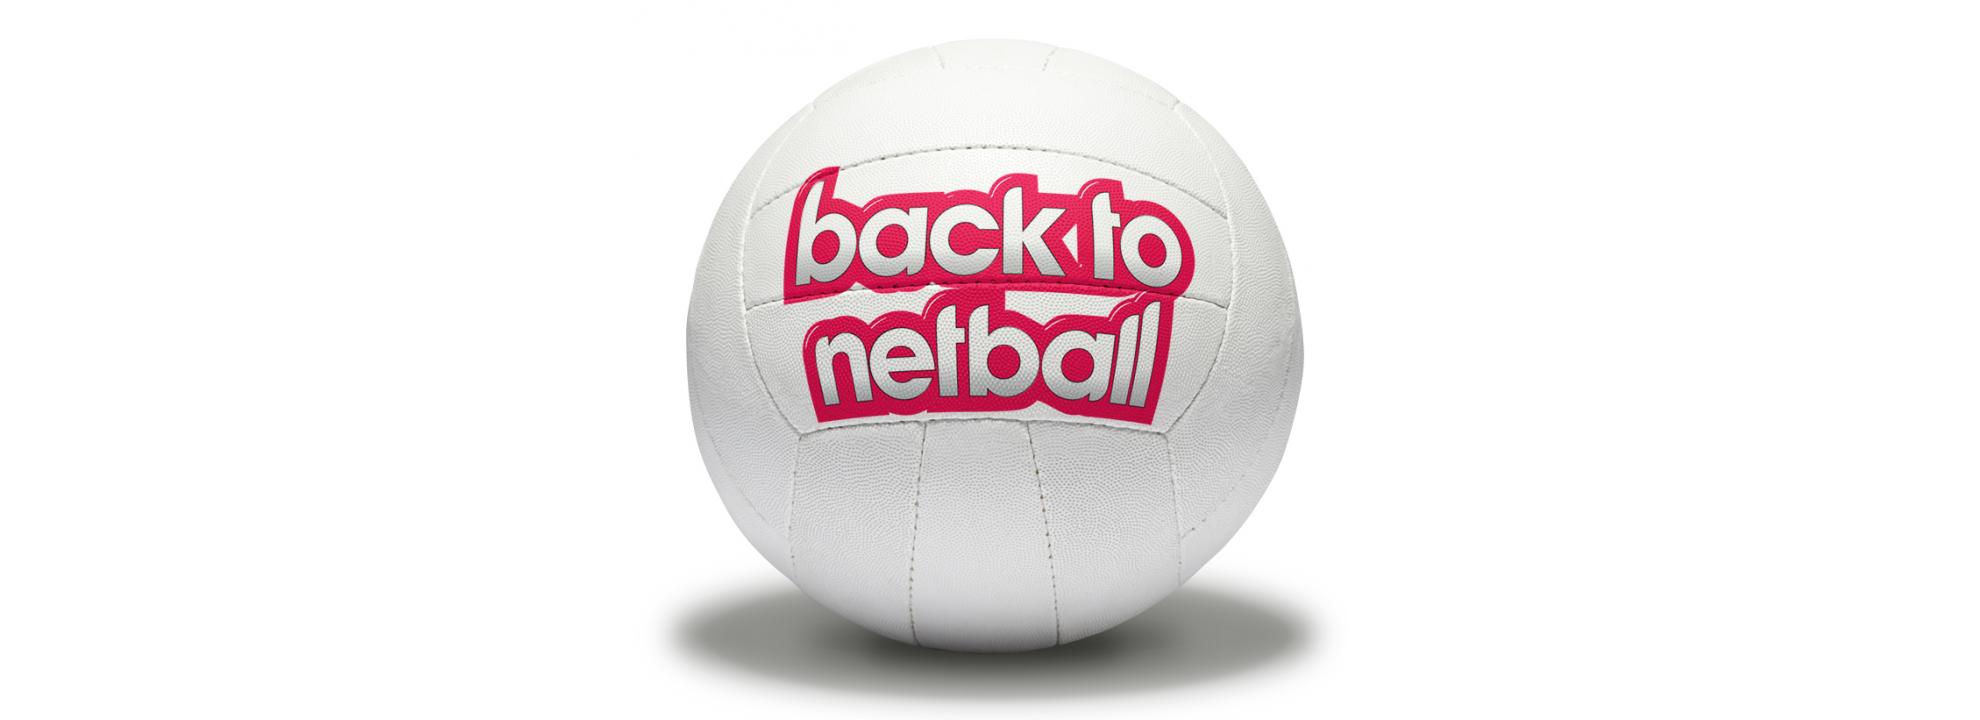 Back to Netball - Slough Banner